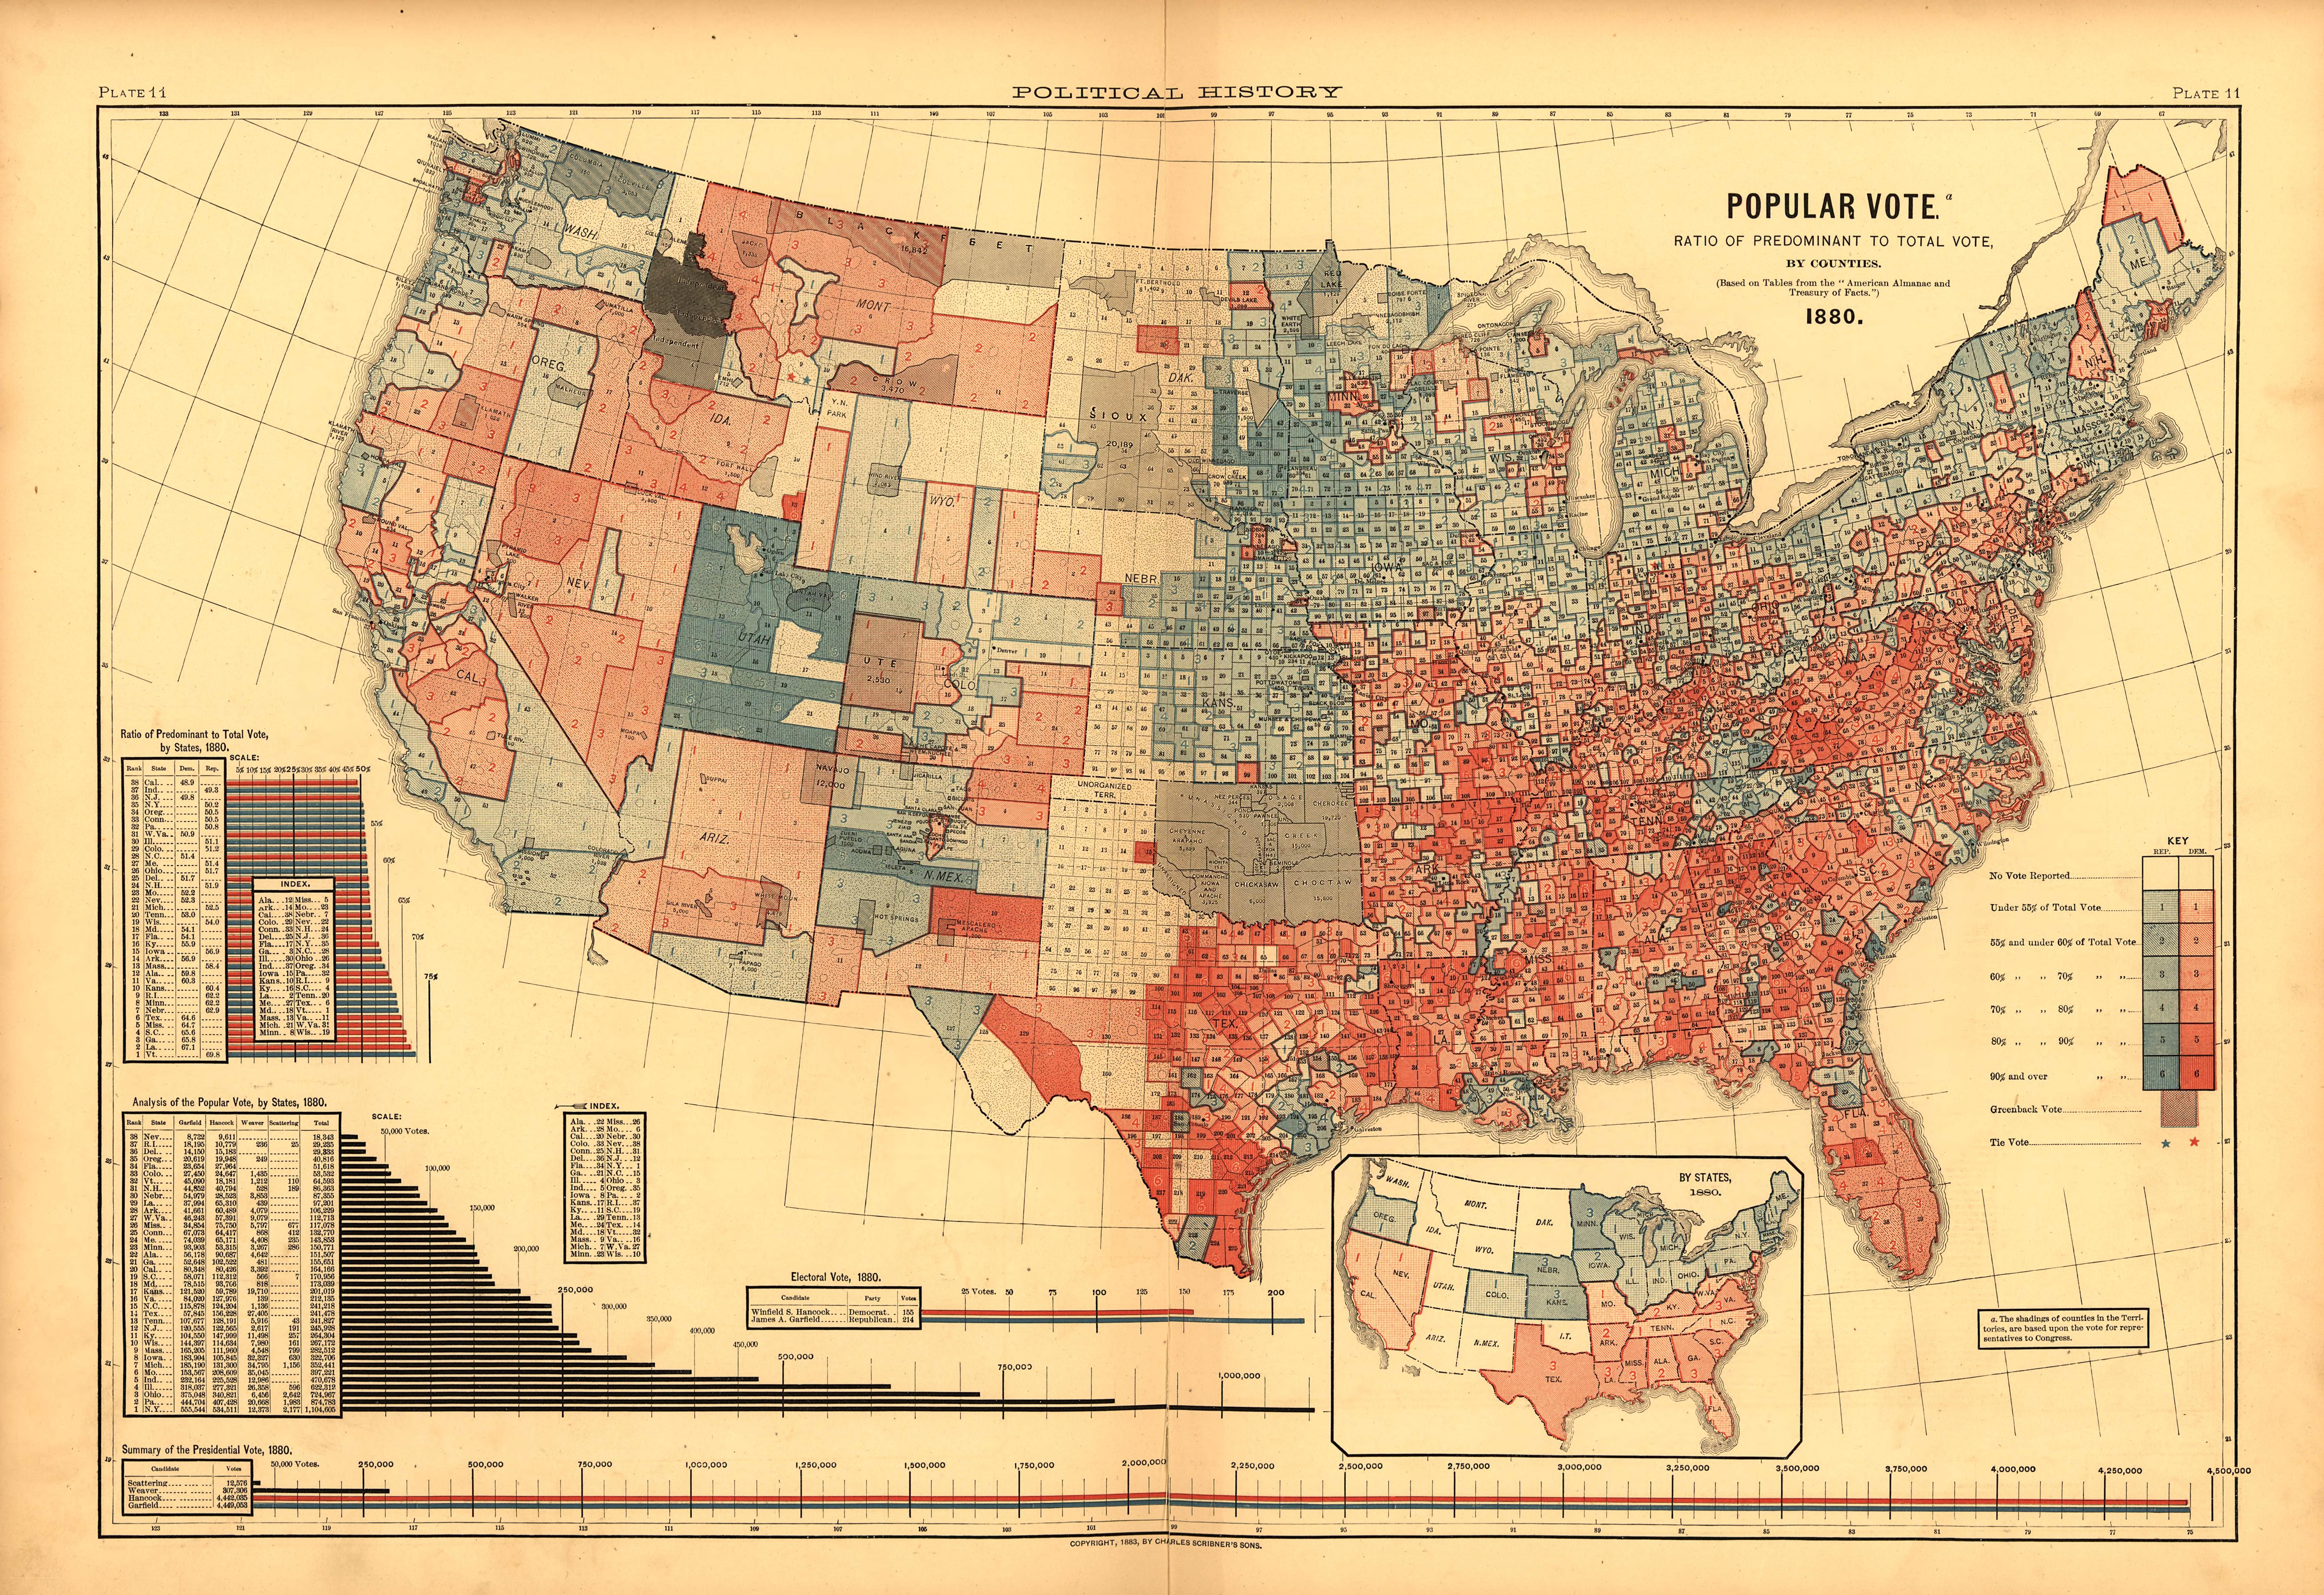 1880 popular vote for HG